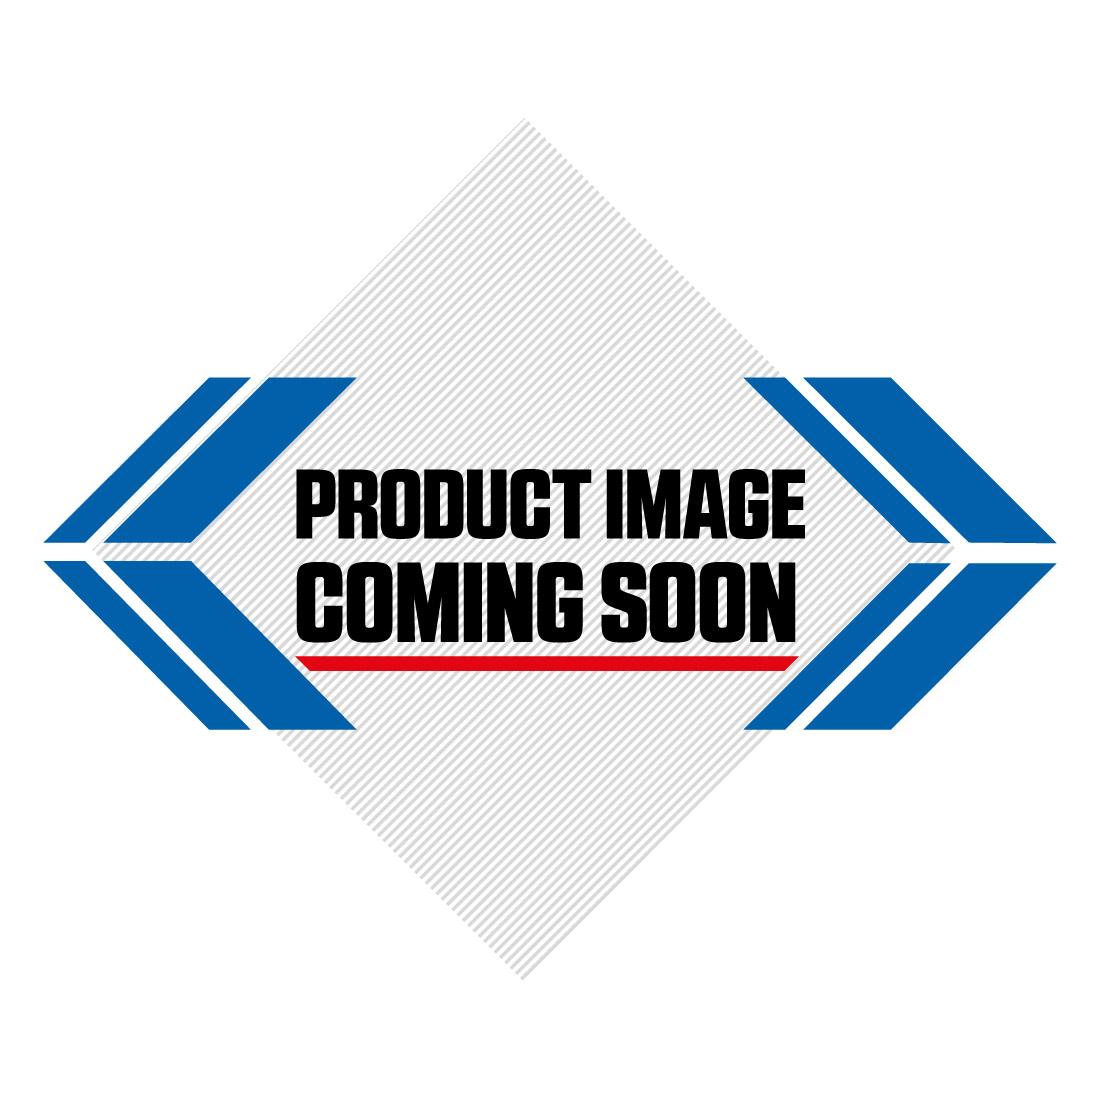 Honda Plastic Kit CRF 230 (08-14) OEM Factory Image-5>